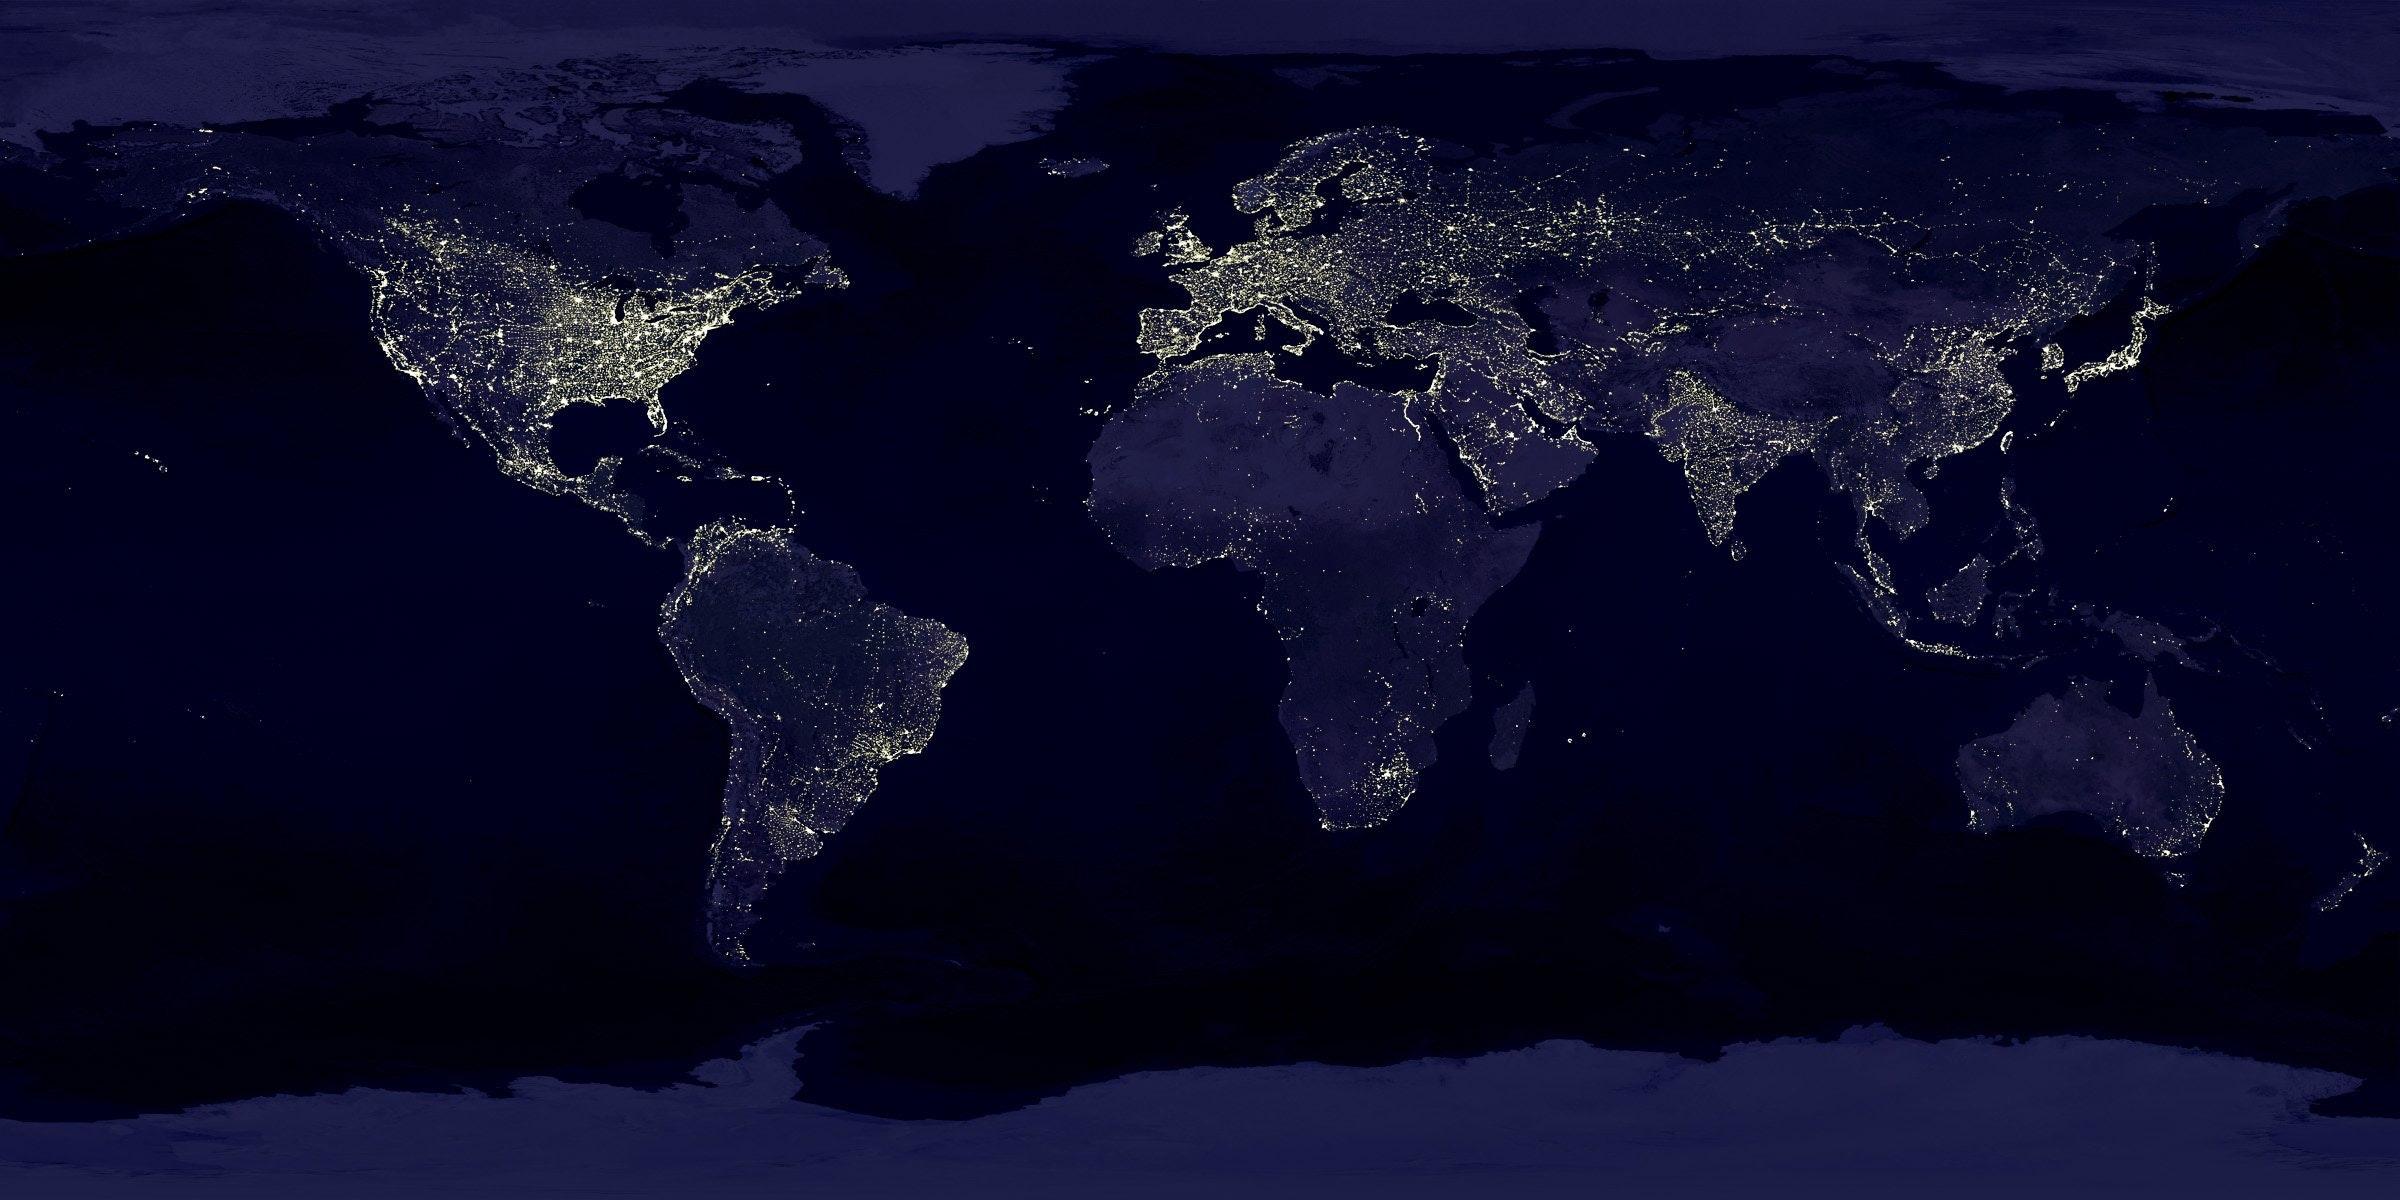 earth-lights-world-41949.jpg